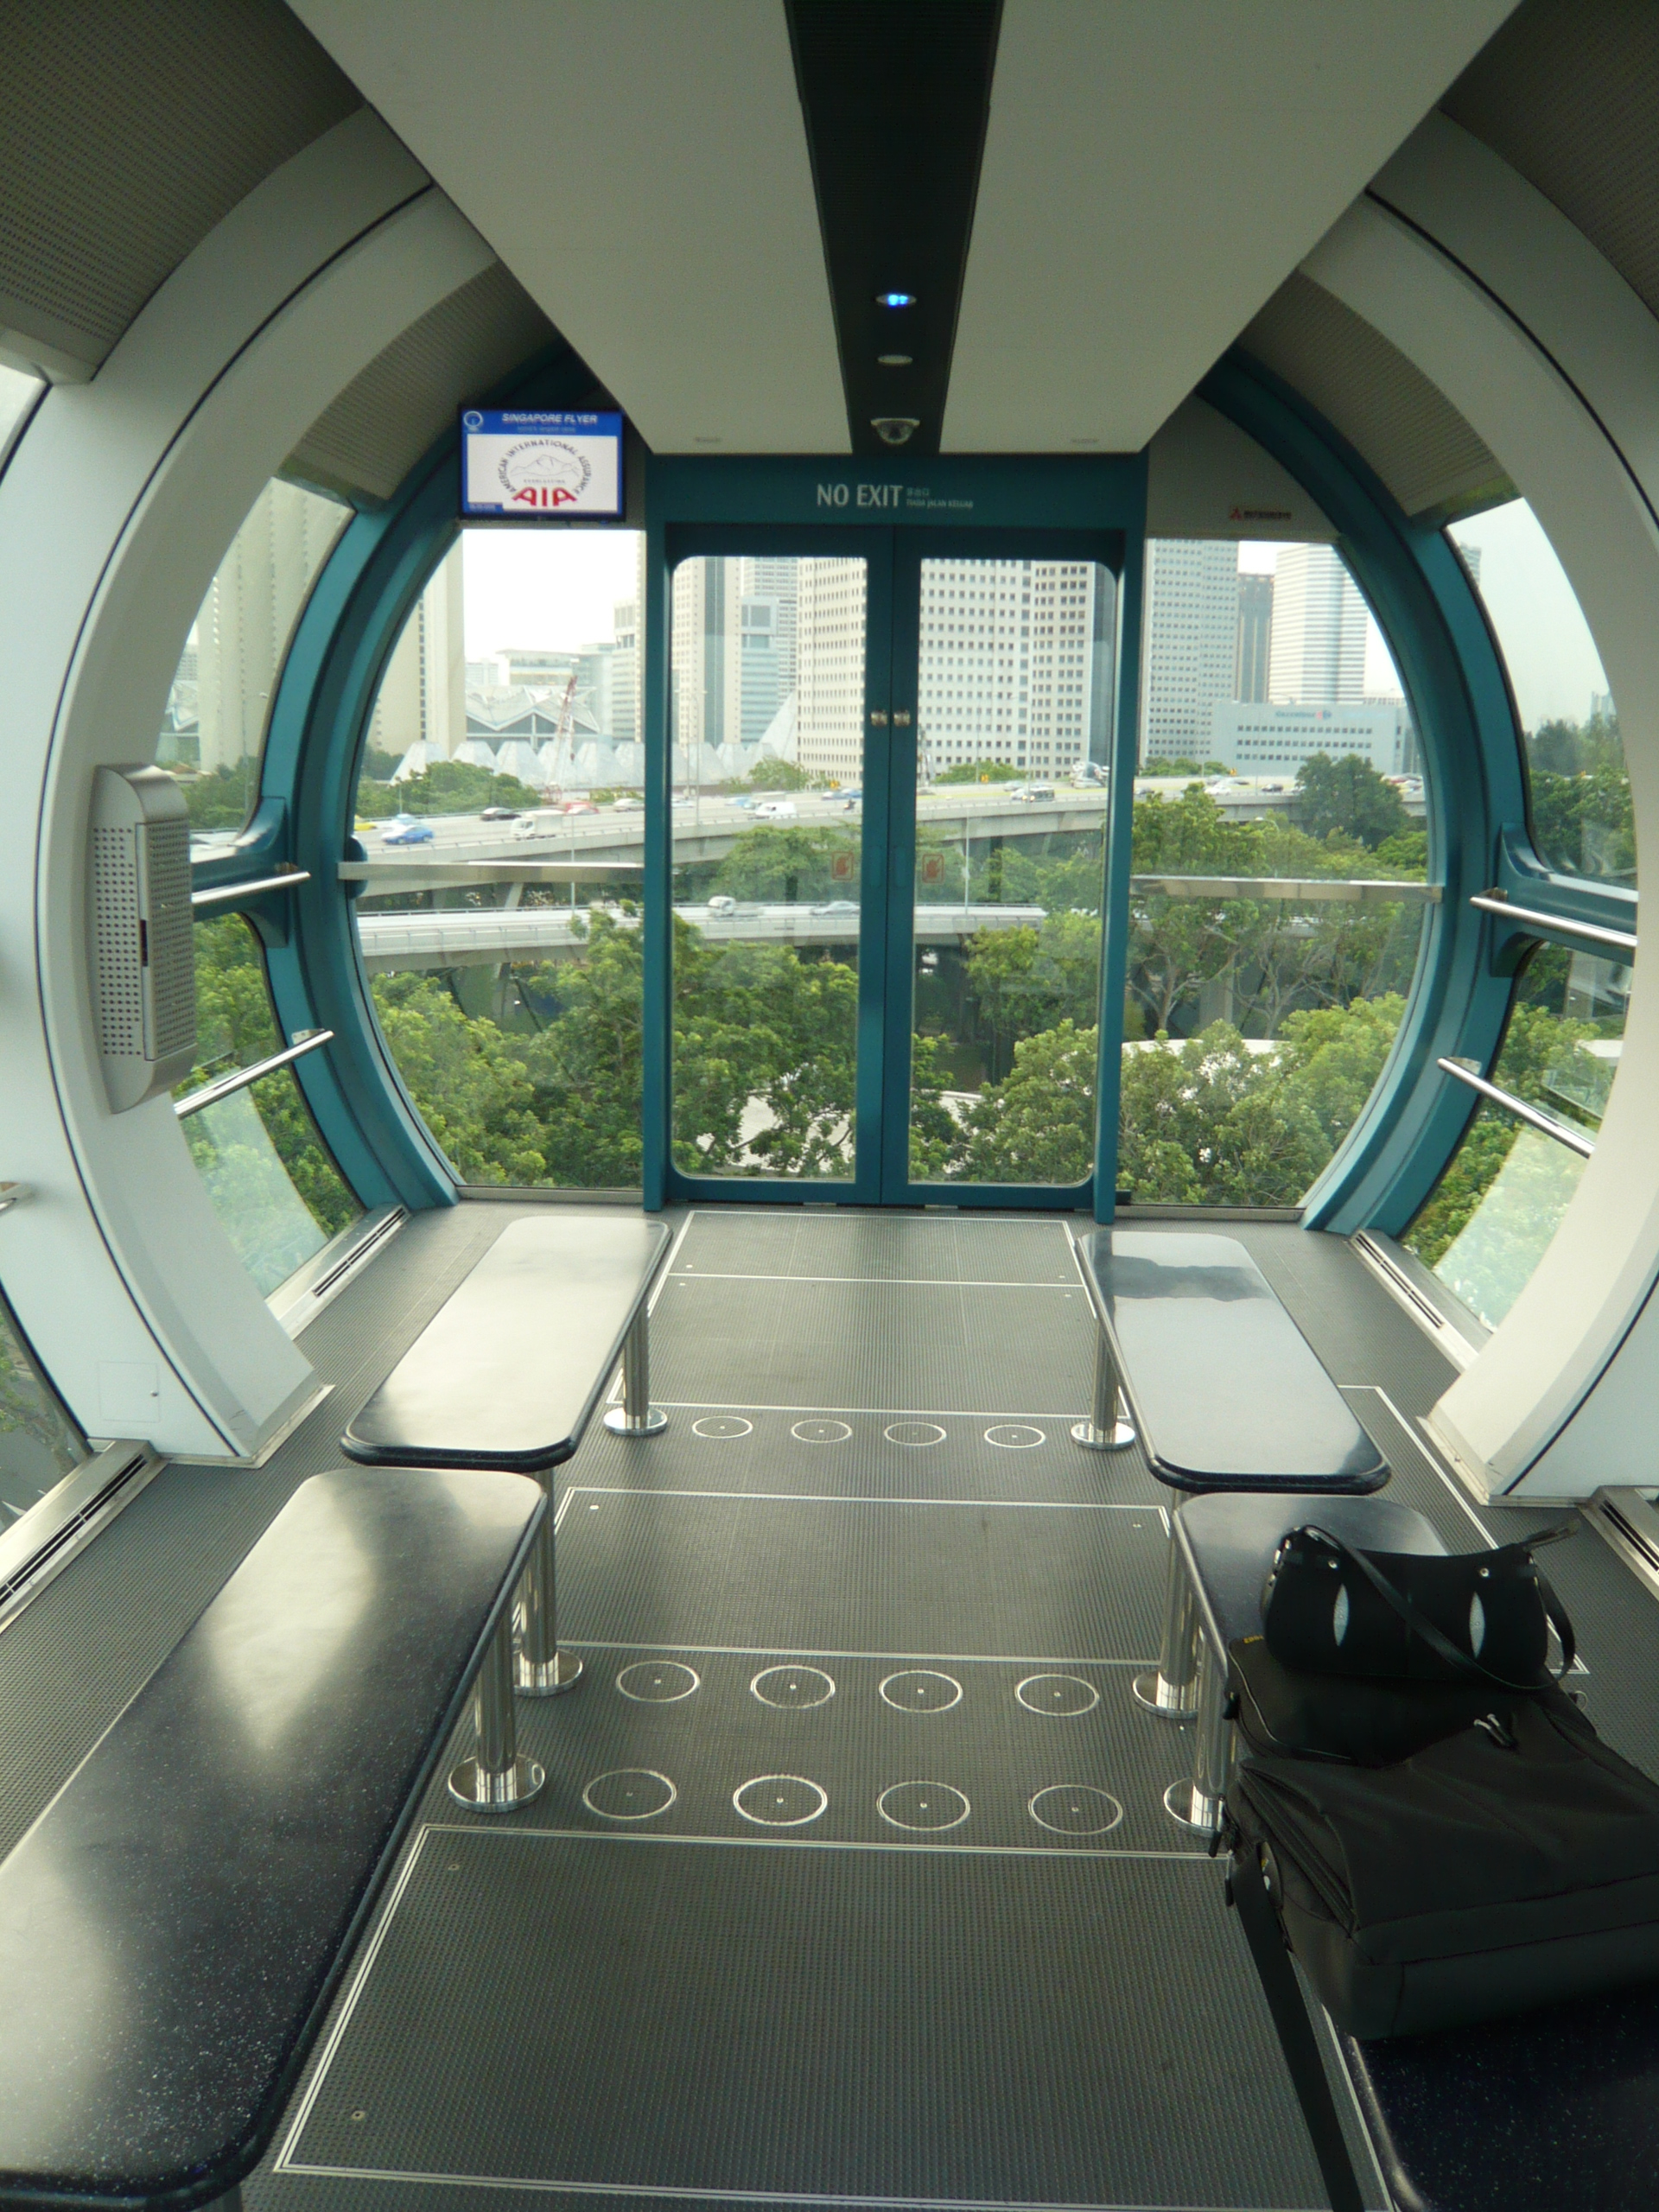 RTW2 II : Raffles - Singapore - Singapore Flyer